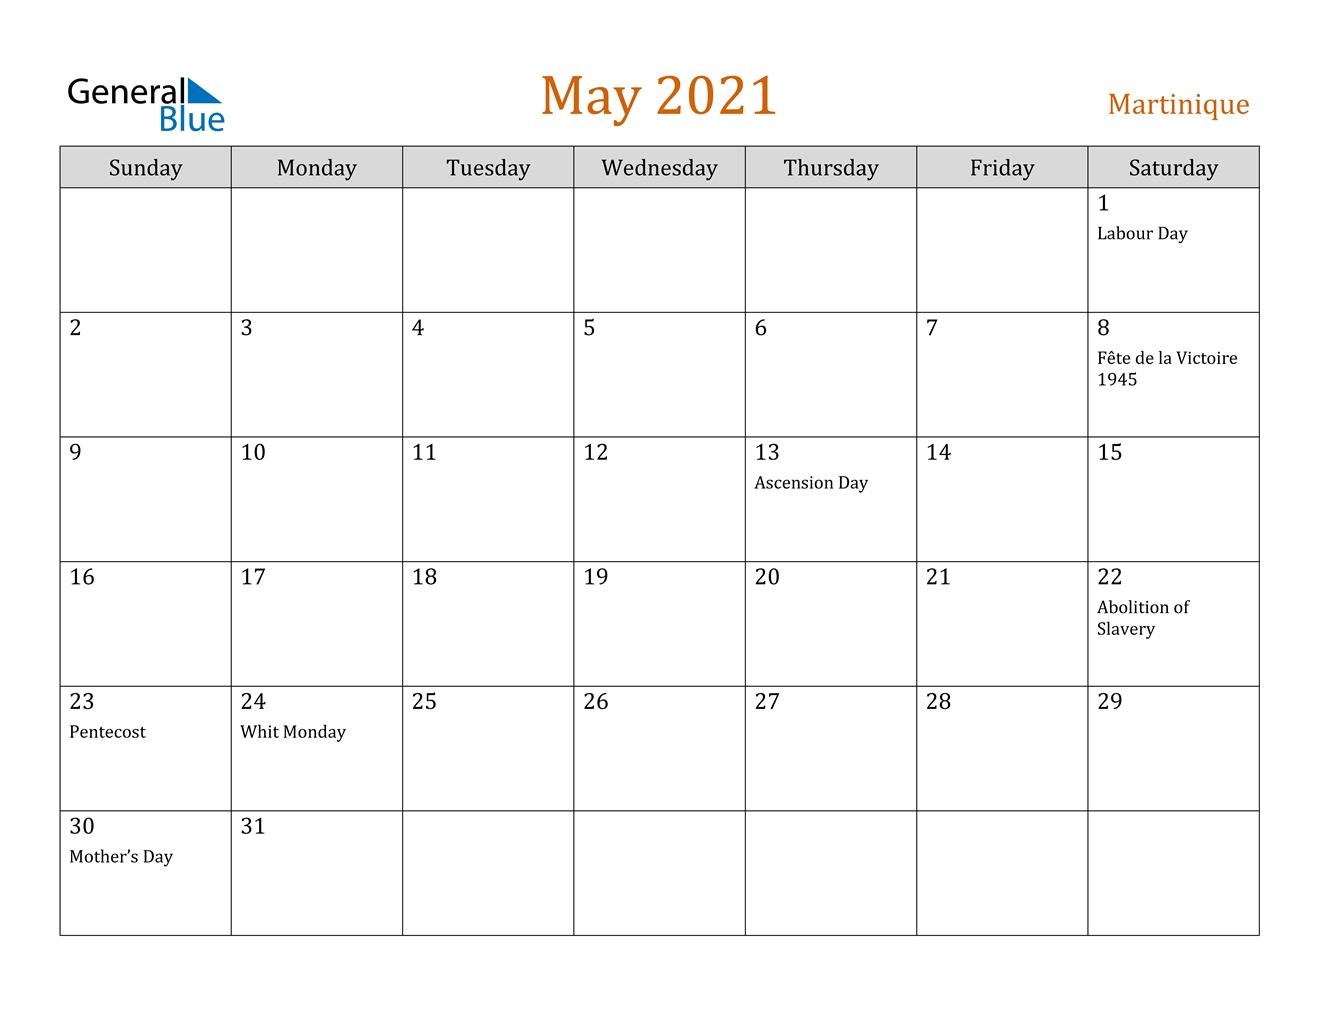 May 2021 Calendar - Martinique